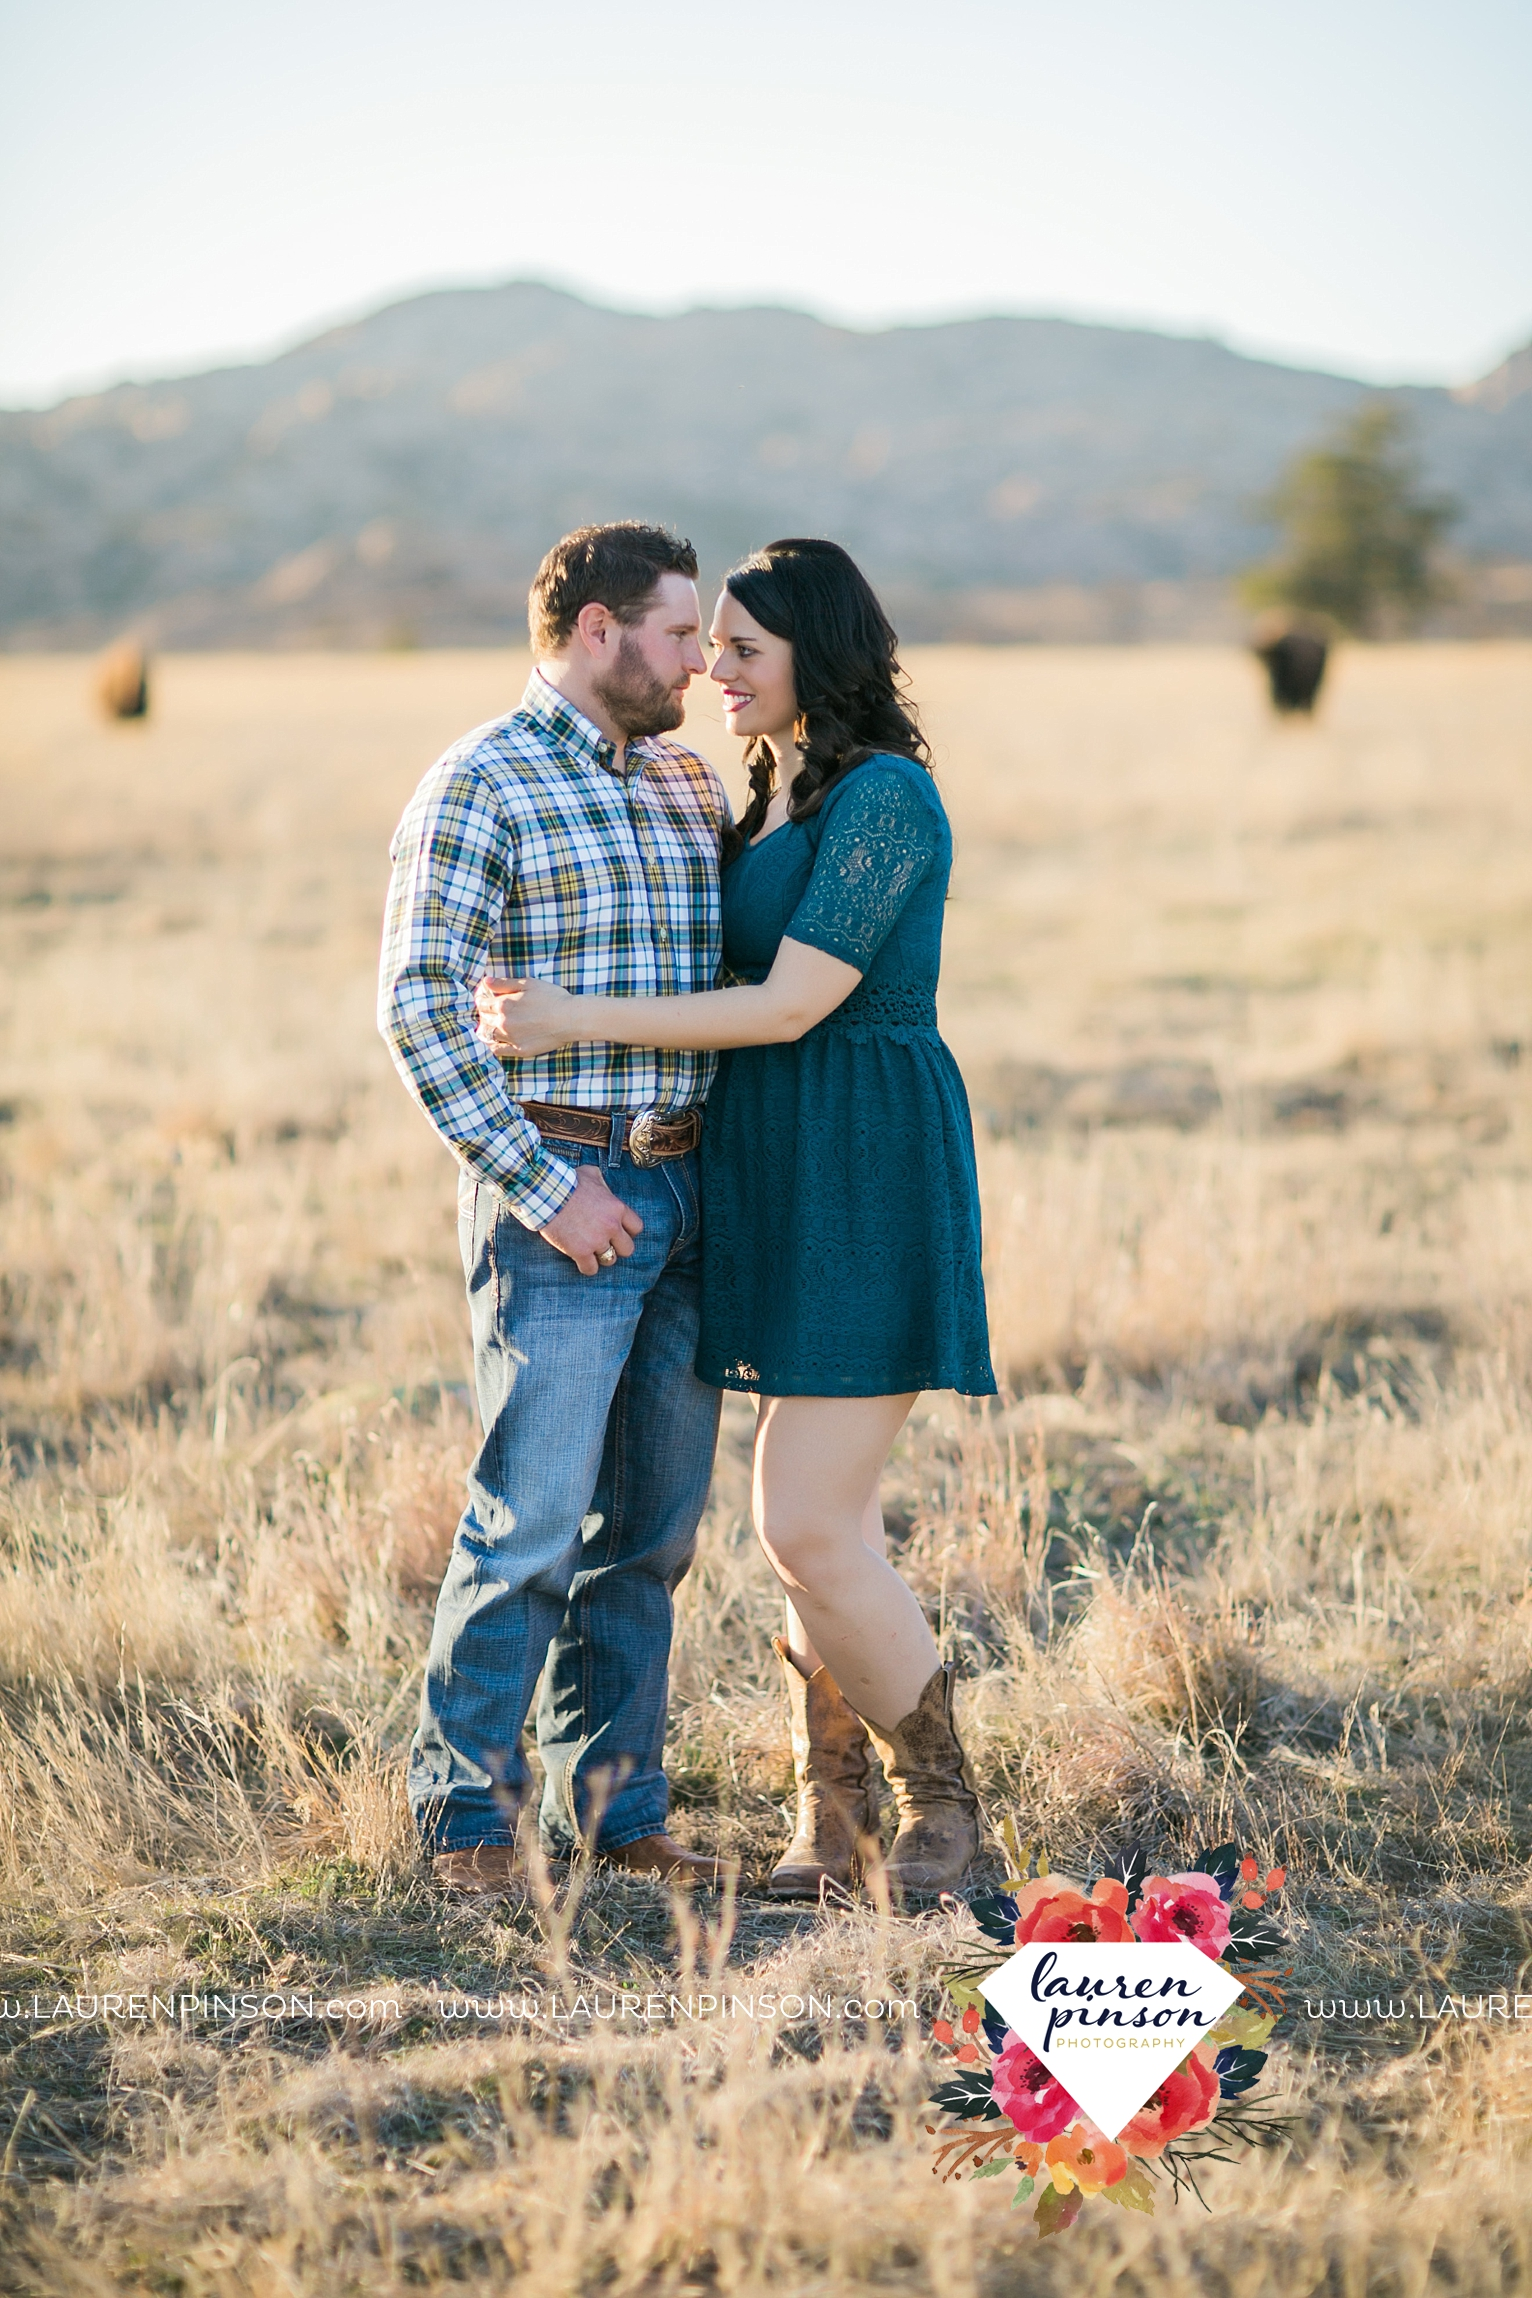 wichita-falls-texas-engagement-photographer-wedding-oklahoma-lawton-wichita-mountains-refuge-outdoors-mountains-engaged_2066.jpg